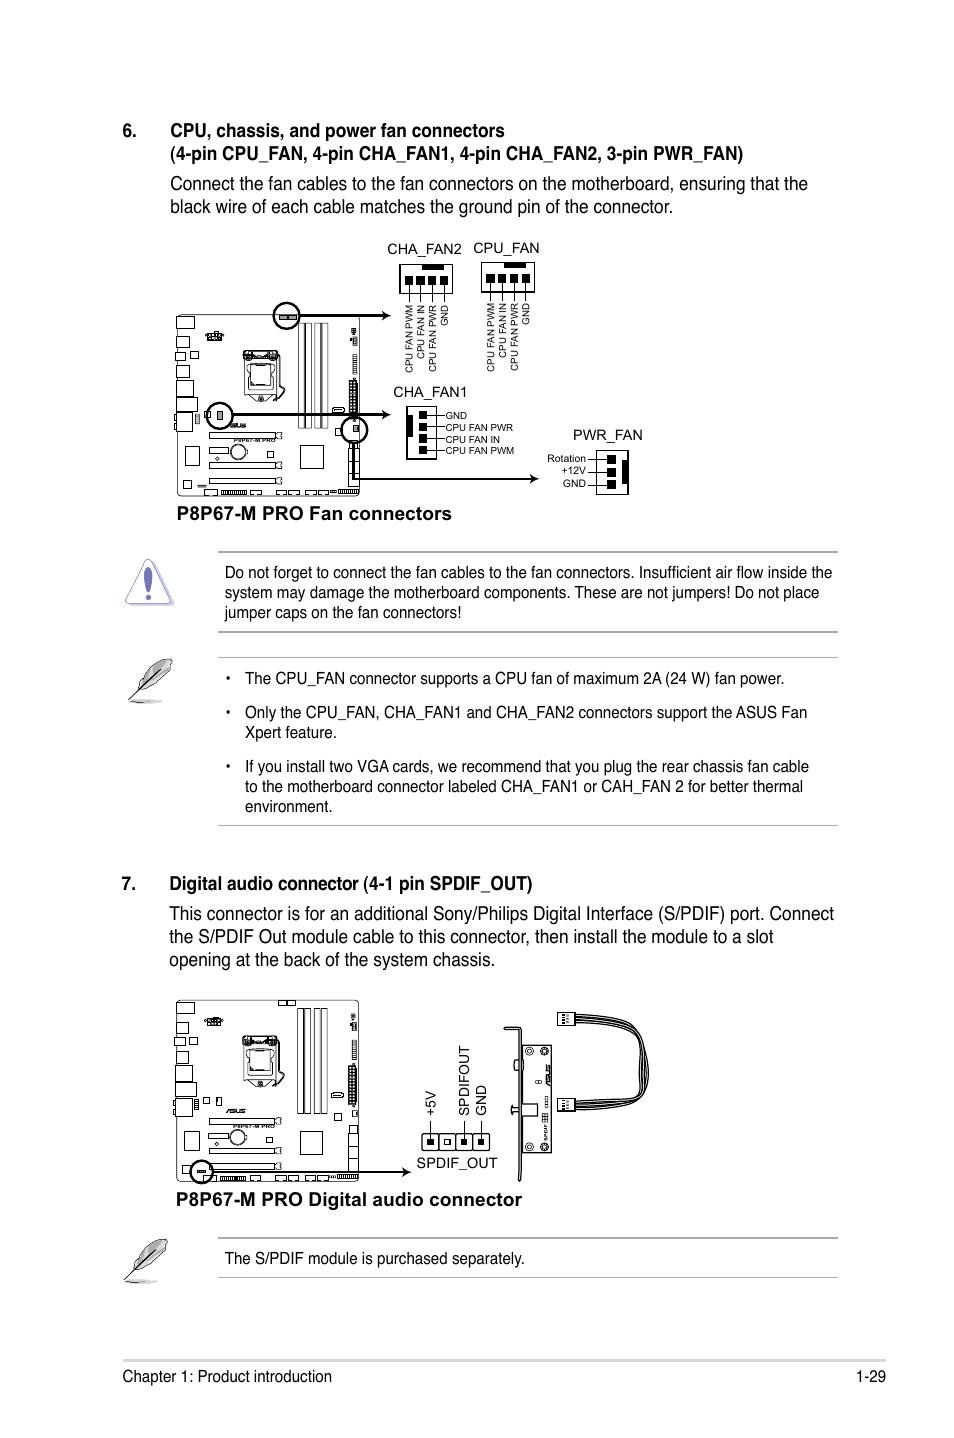 p8p67 m pro fan connectors p8p67 m pro digital audio connector rh manualsdir com